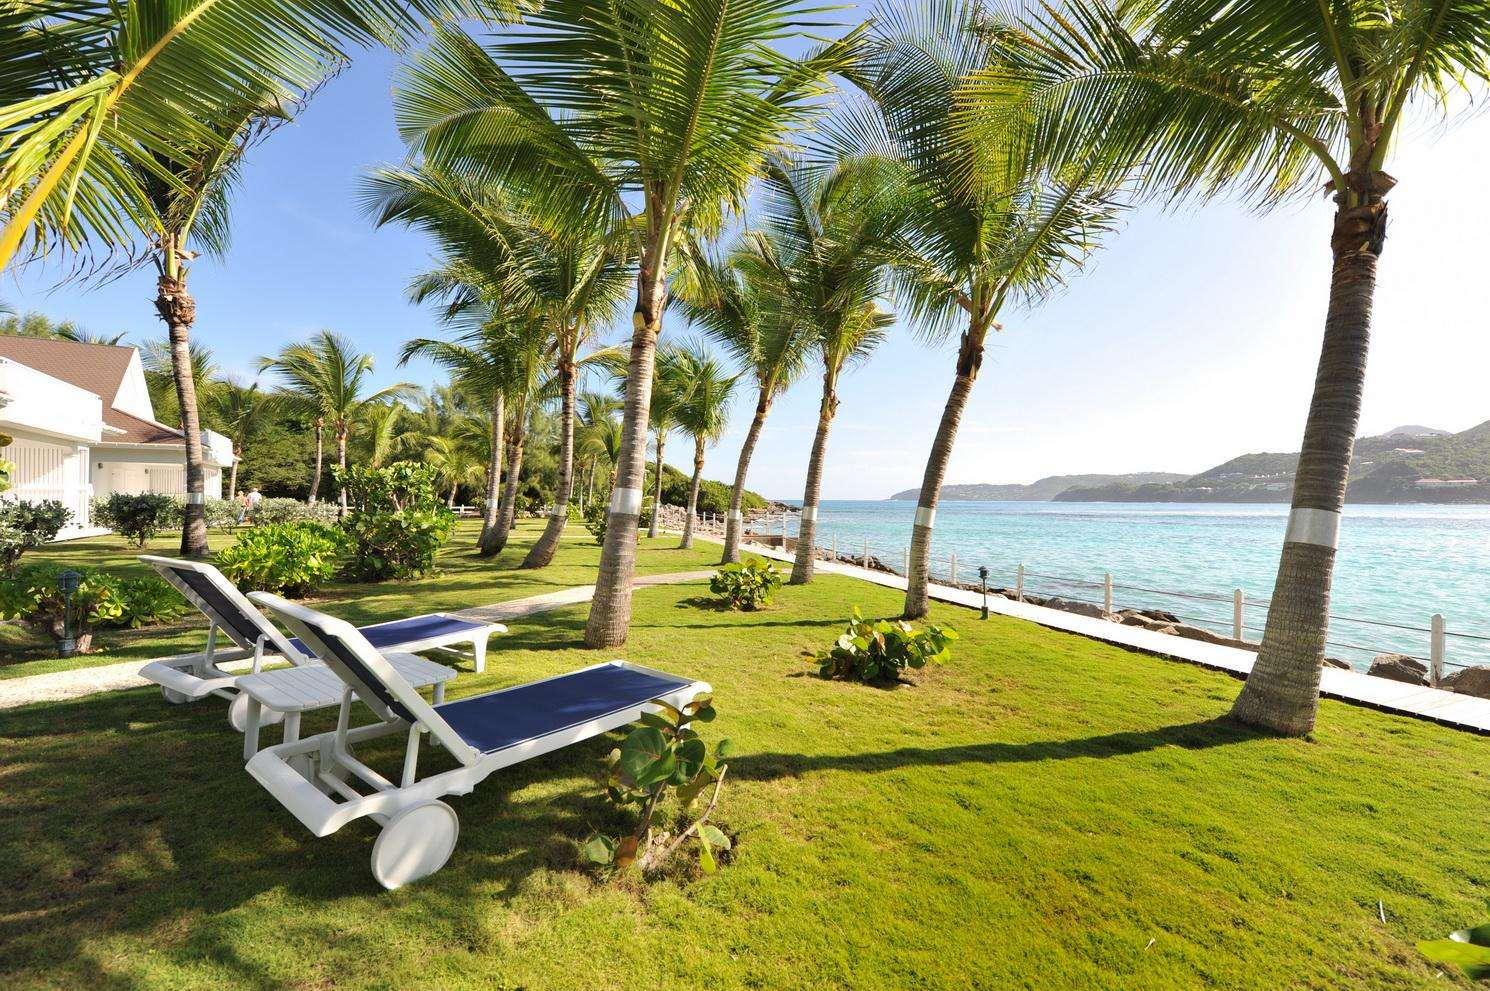 Luxury villa rentals caribbean - St barthelemy - Saint jean - No location 4 - Dahouët - Image 1/22